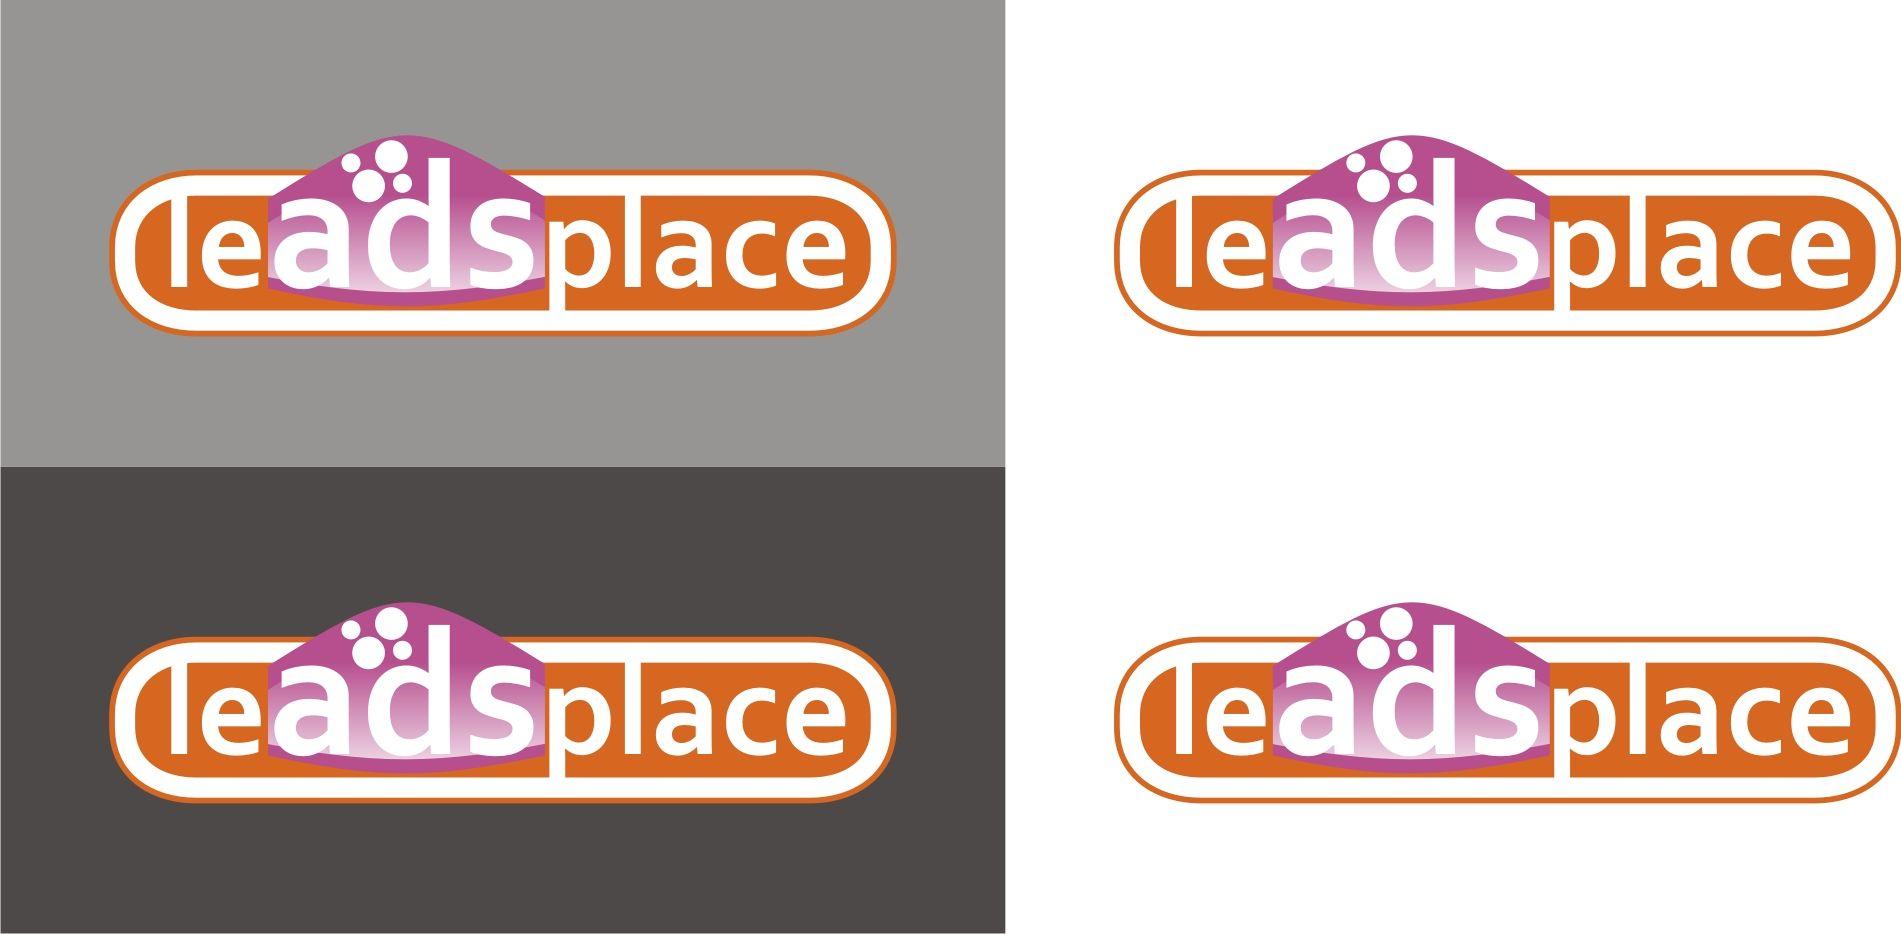 leadsplace.com - логотип - дизайнер Lucknni